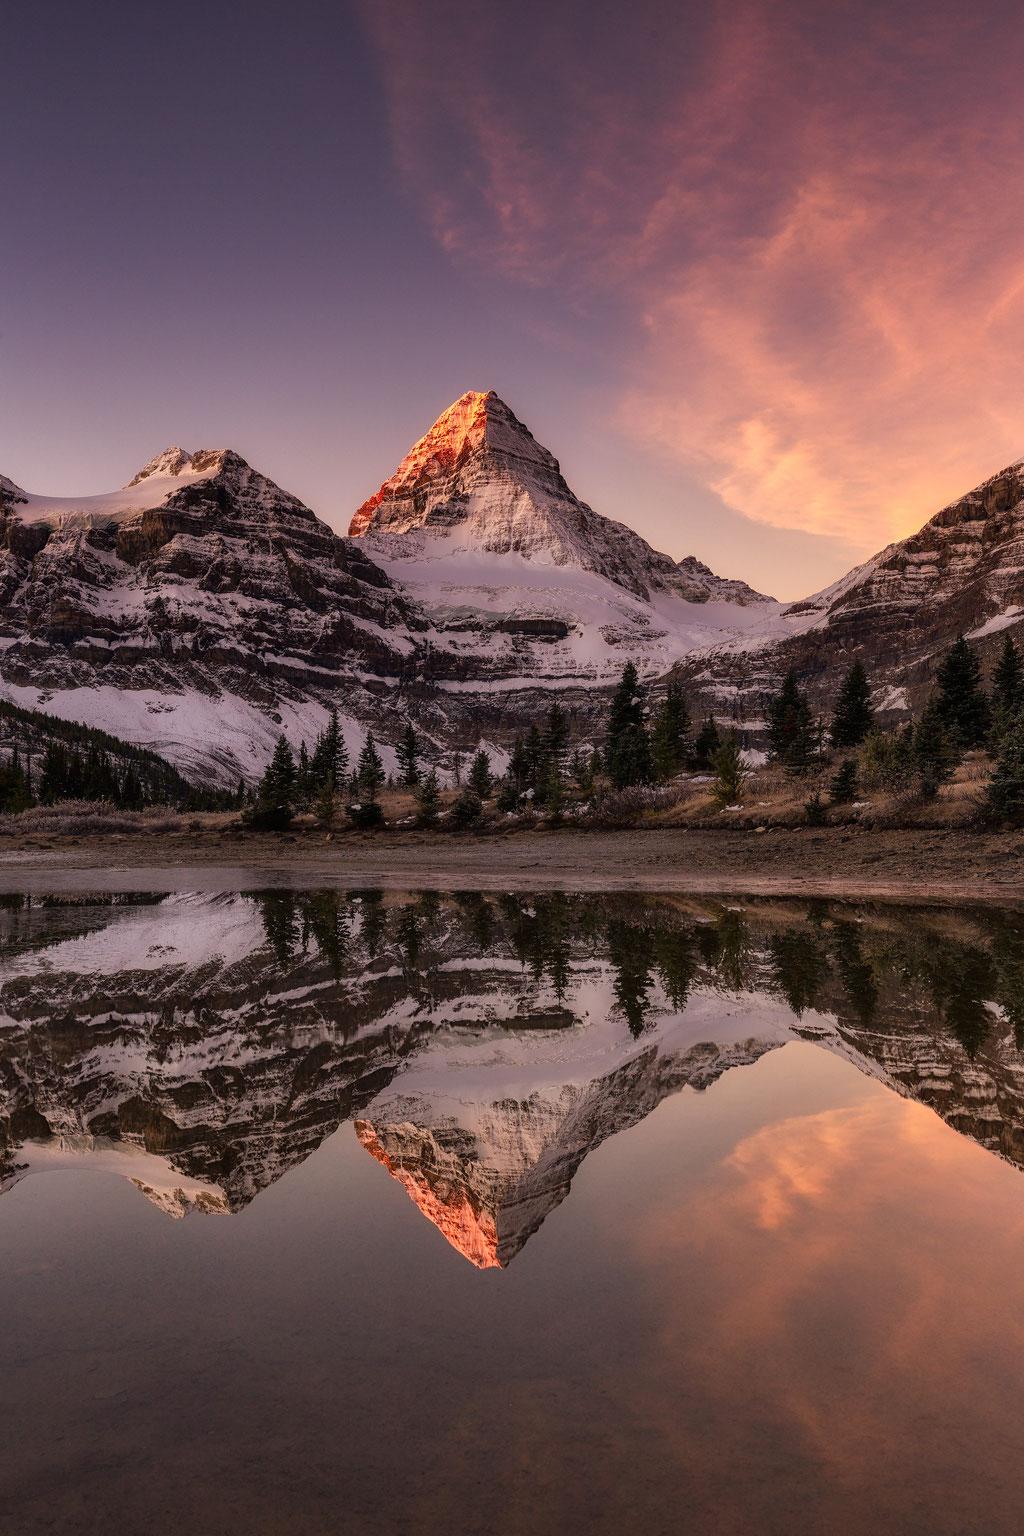 Sunrise reflections of Mount Assiniboine. Mount Assiniboine Photography workshop